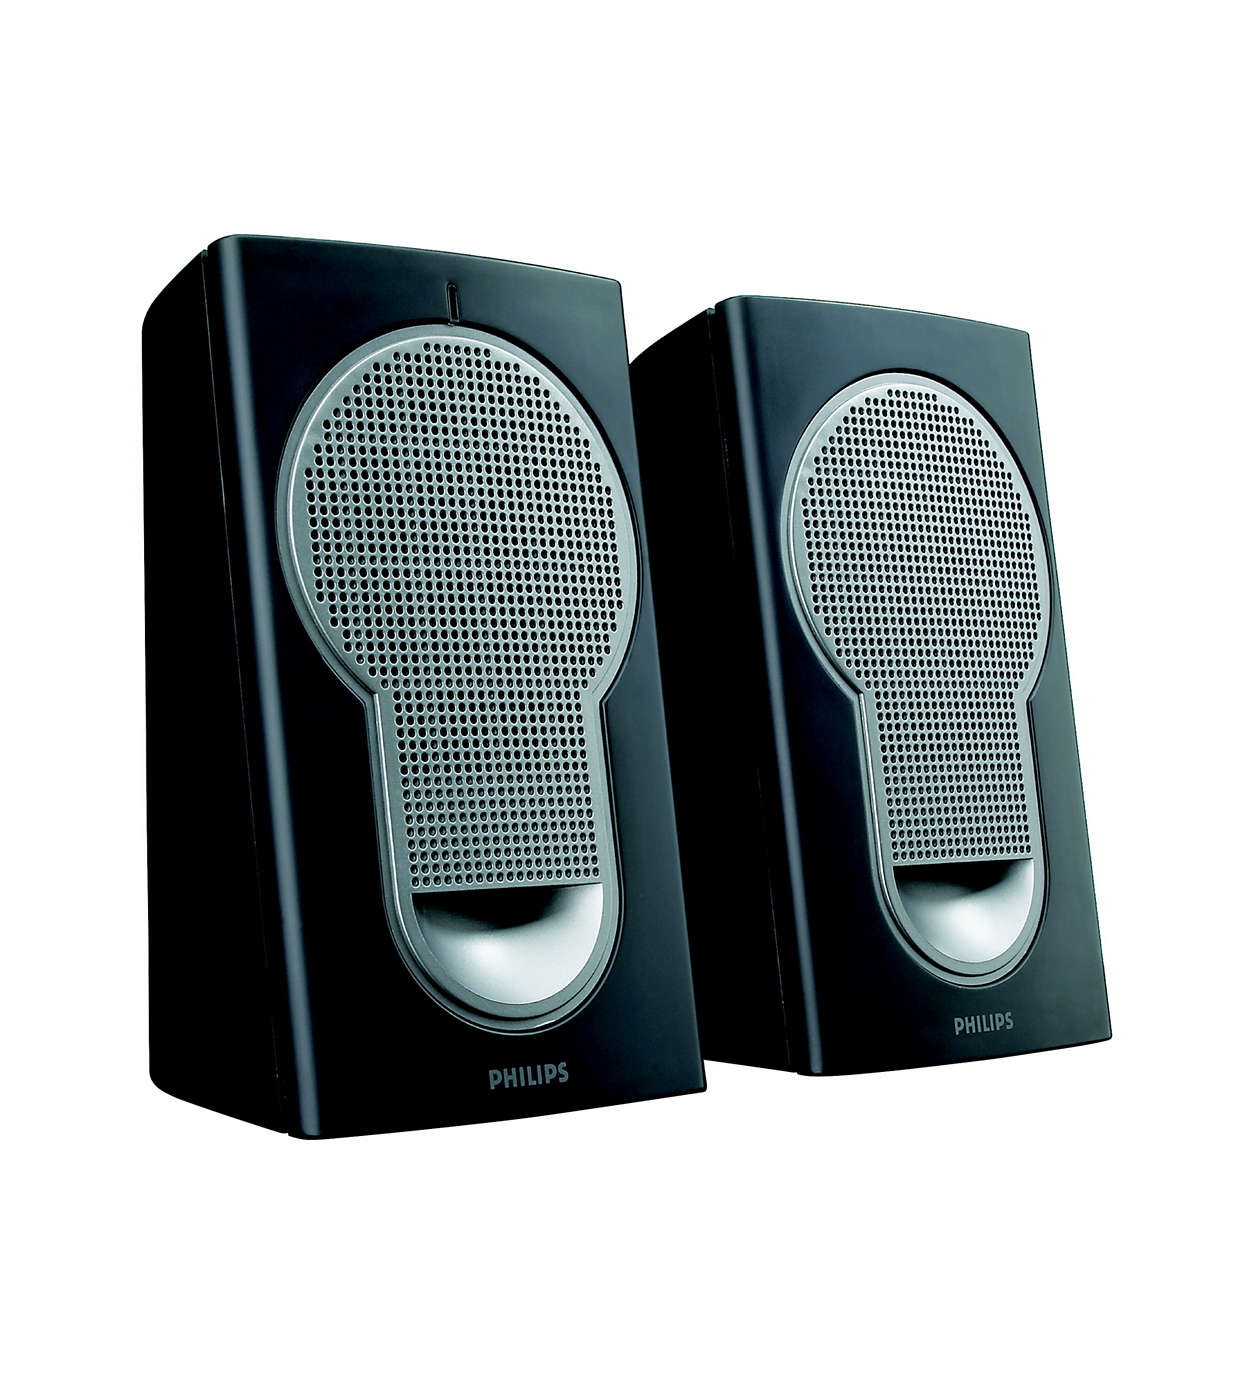 Upea ääni, kompaktit kaiuttimet